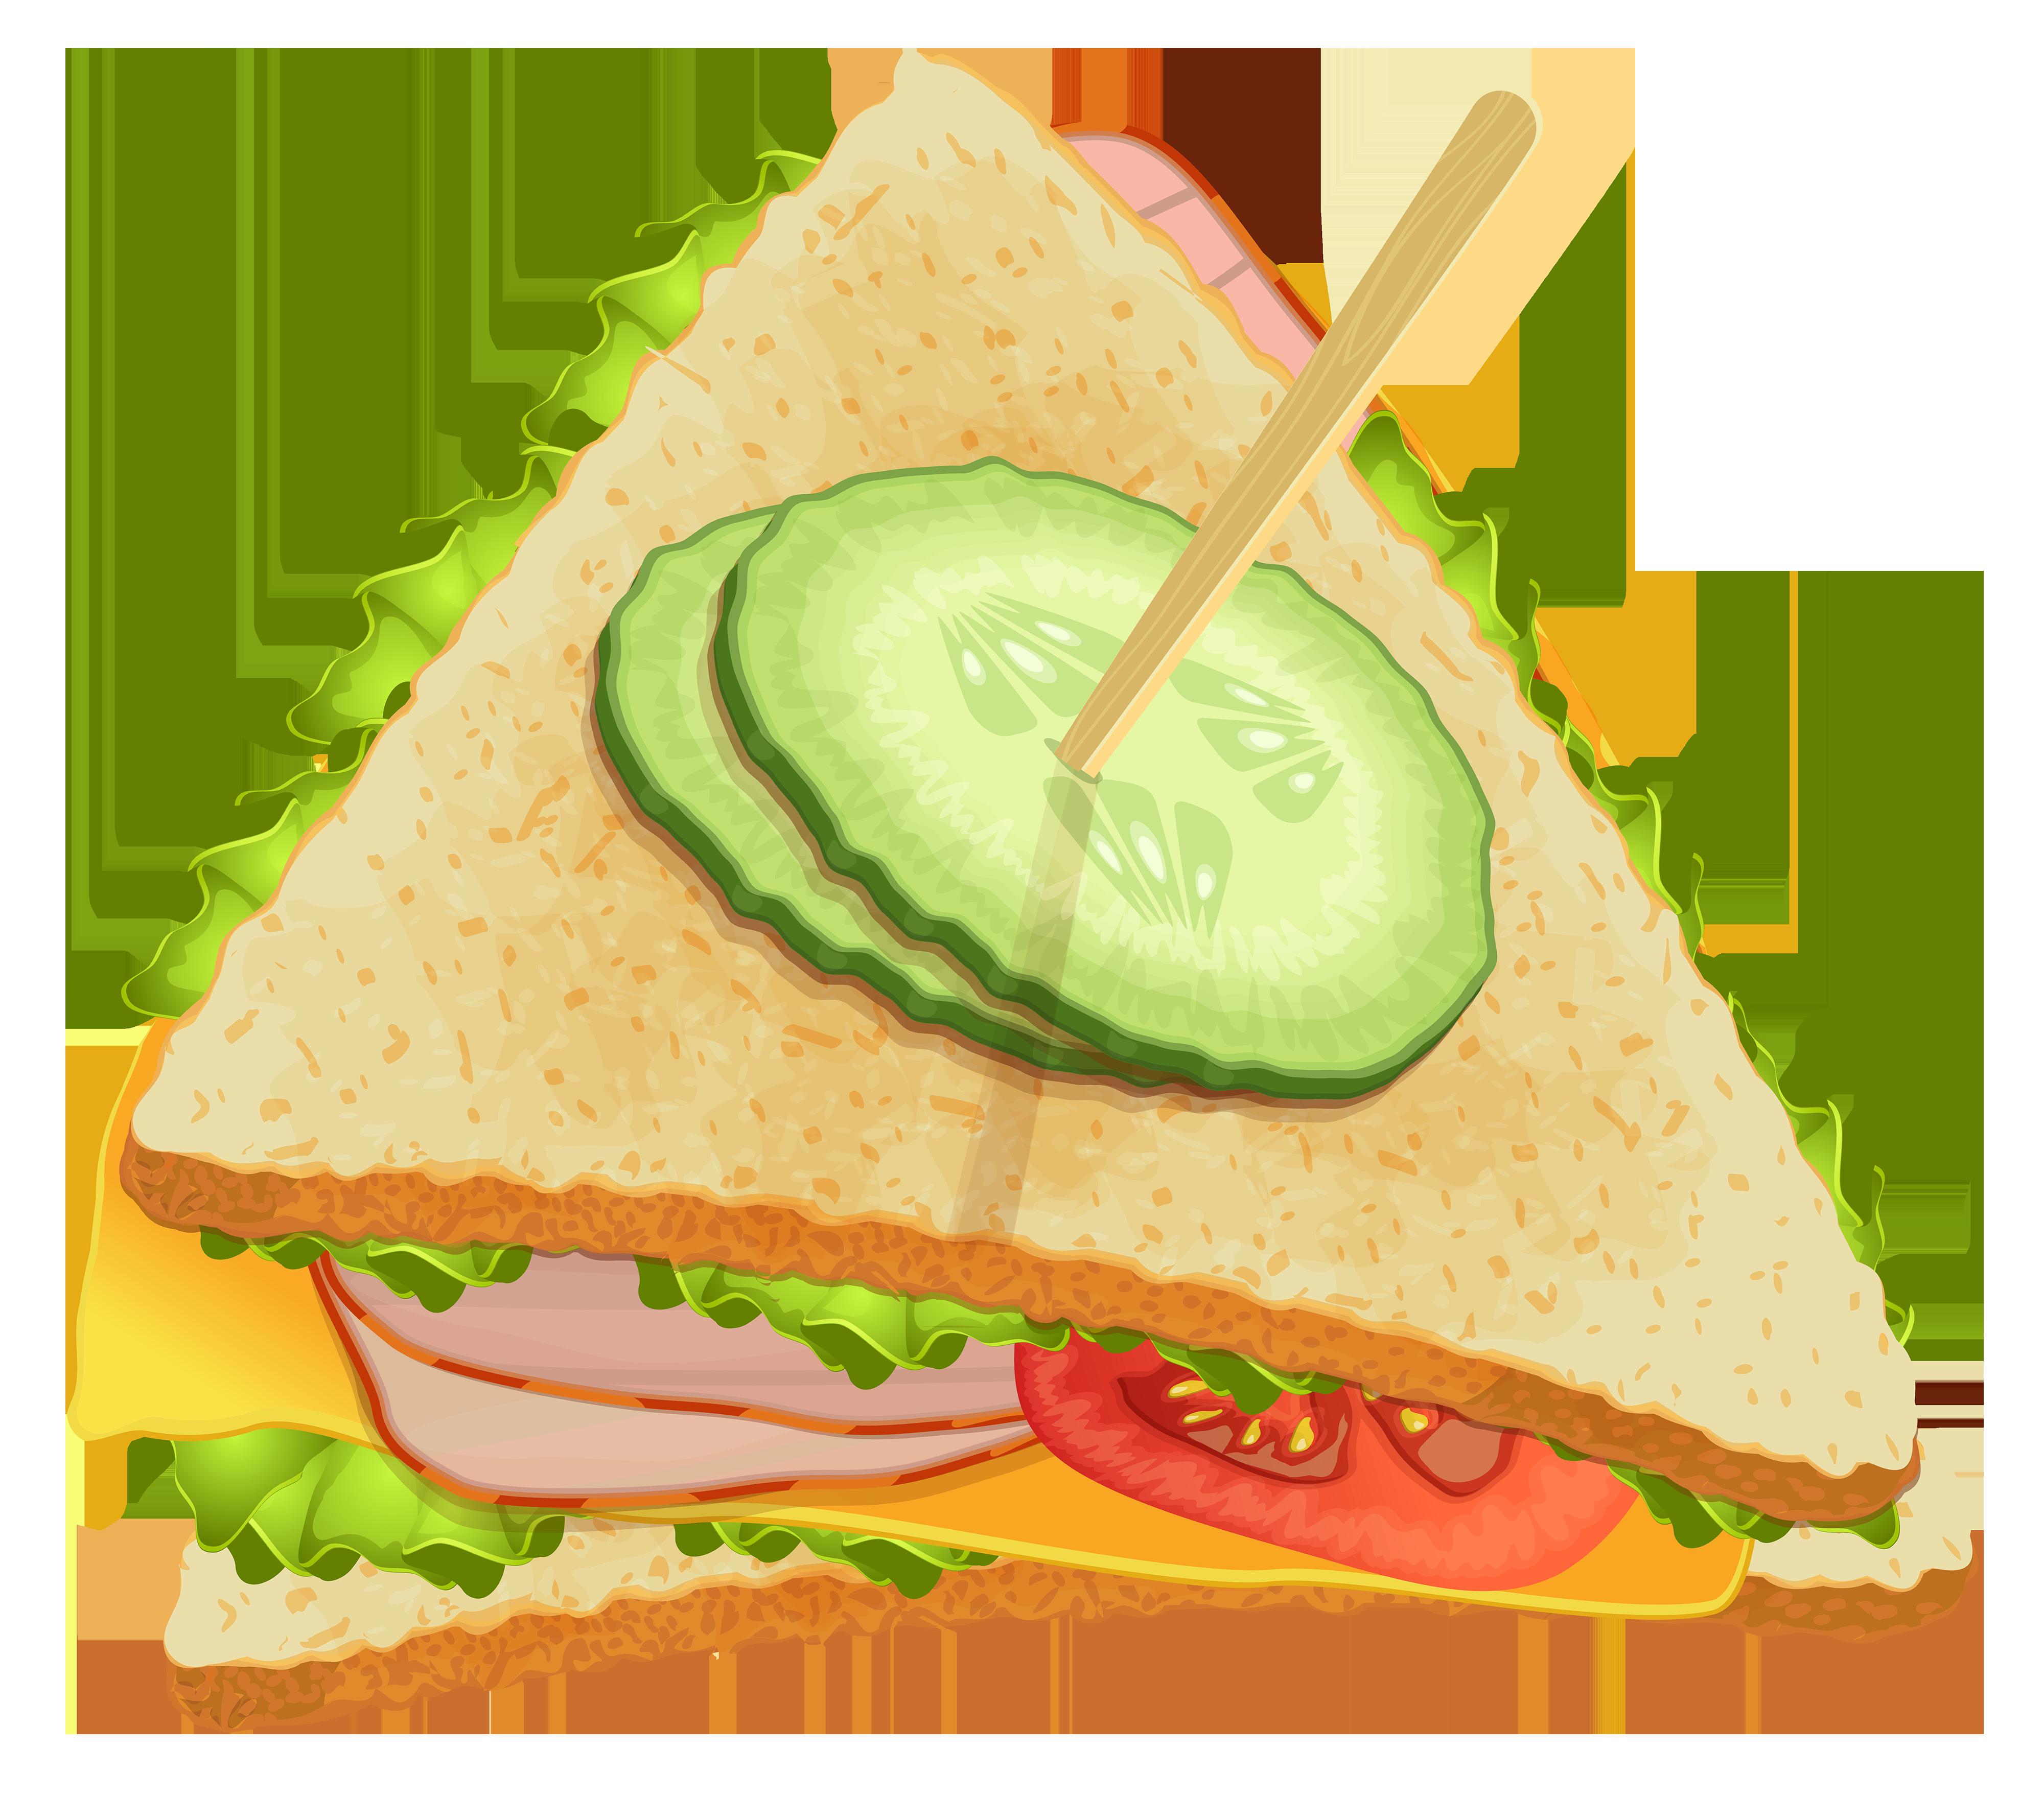 Triangle clipart triangle sandwich Sandwich RoyaltyFree cartoon Images Triangle